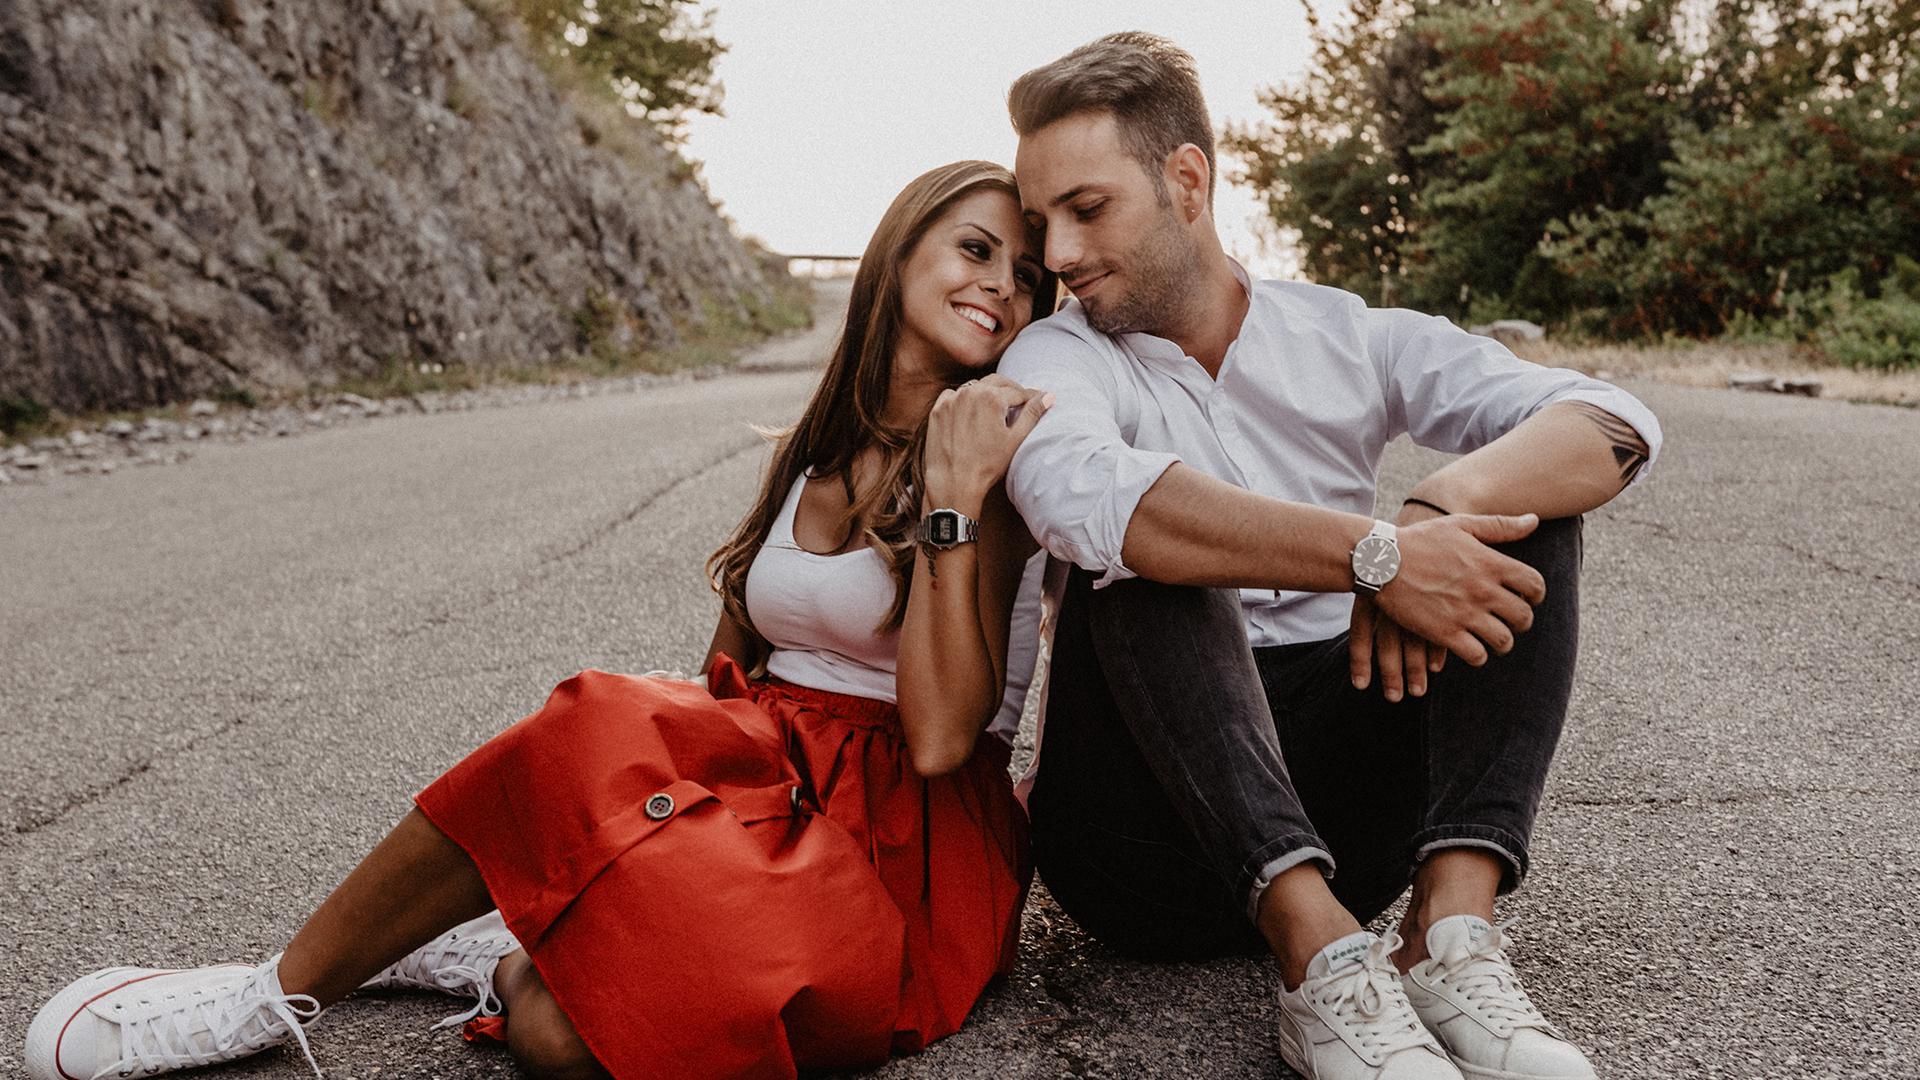 paola_simonelli_fotografo-matrimonio-fondi-terracina-gaeta-itri-sperlonga-wedding-engagment-session-prewedding-madonna-della-rocca